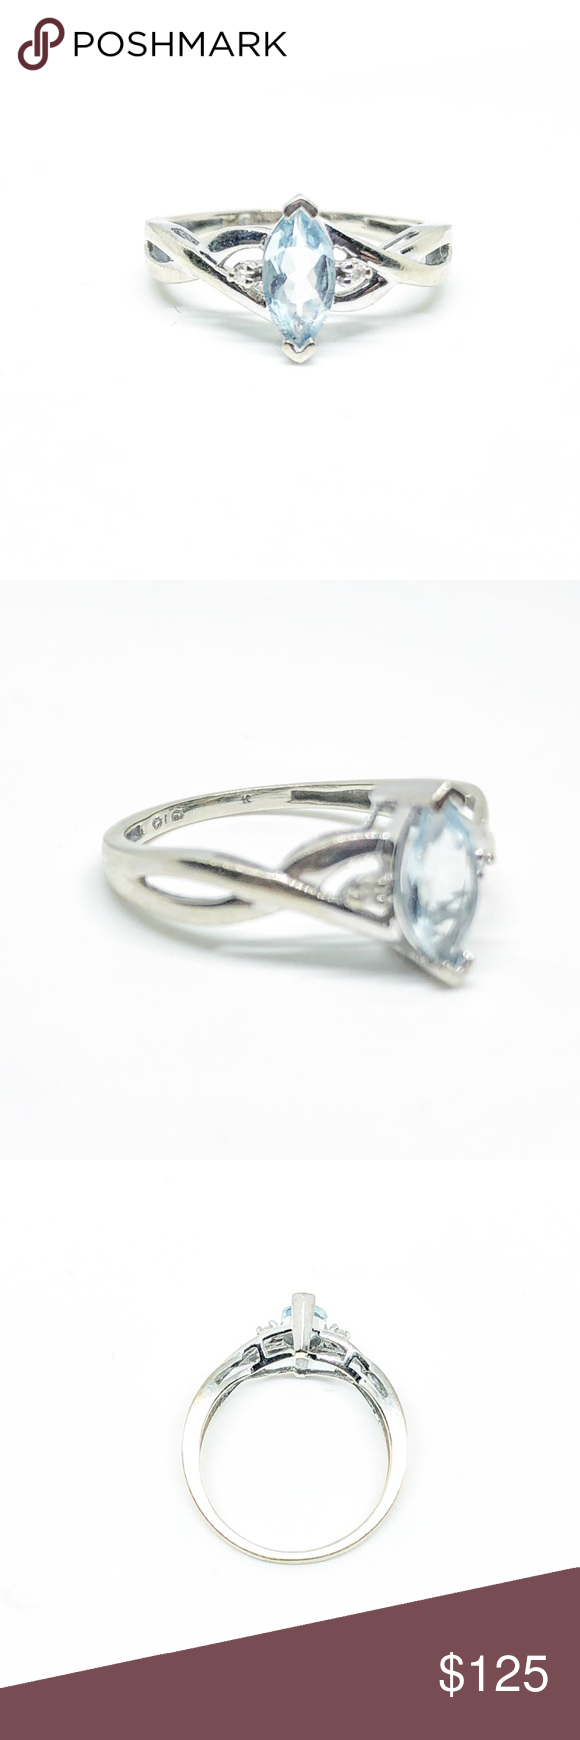 Sold 10k White Gold Aquamarine Diamond Ring White Gold Diamond Diamond Ring